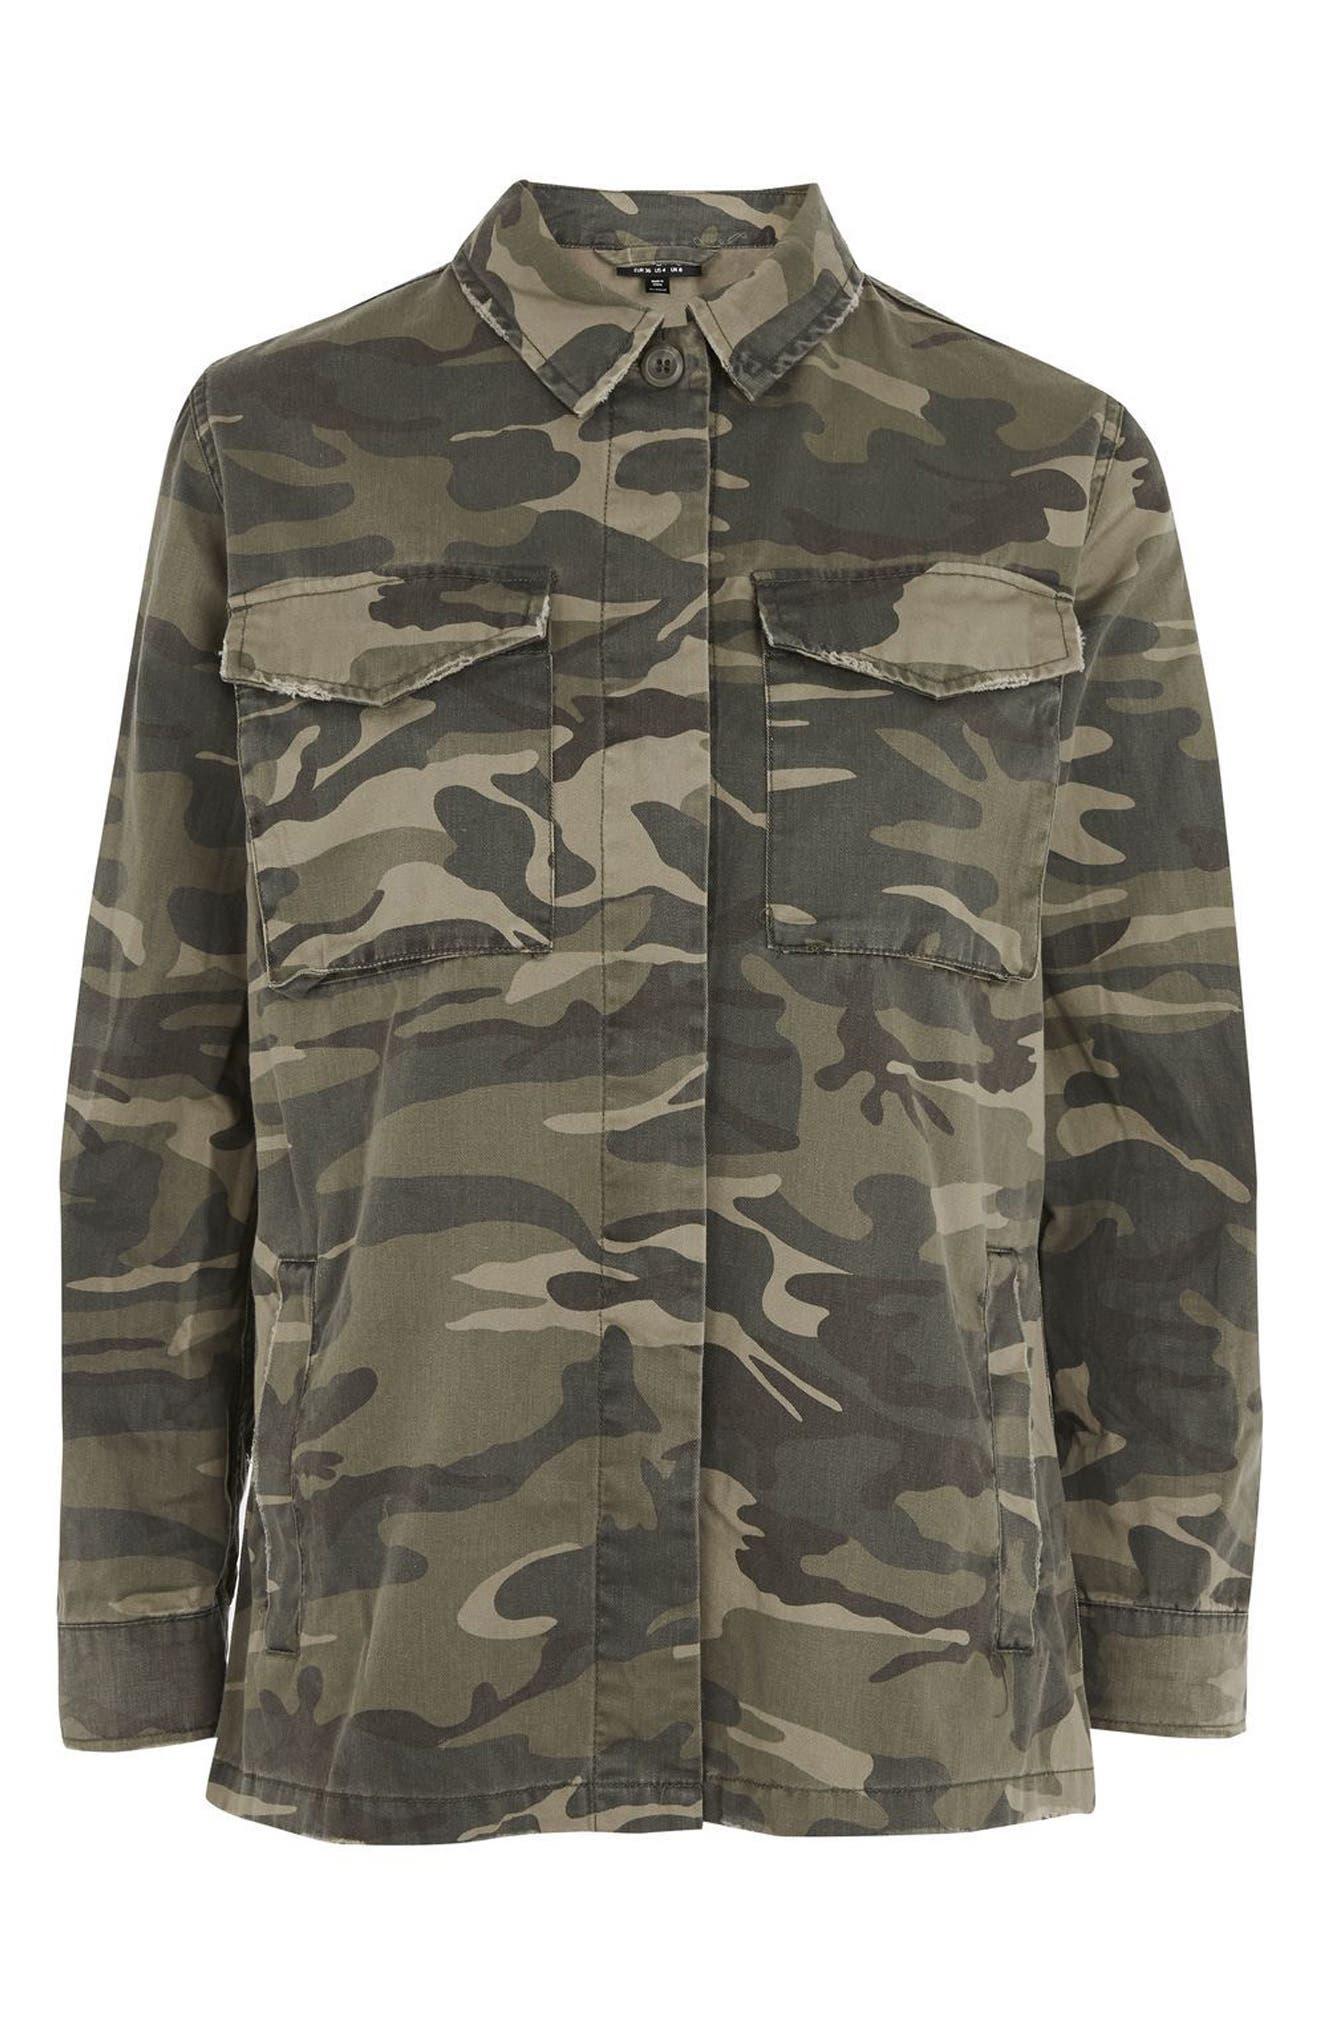 TOPSHOP, Sampson Camo Shirt Jacket, Alternate thumbnail 4, color, 300